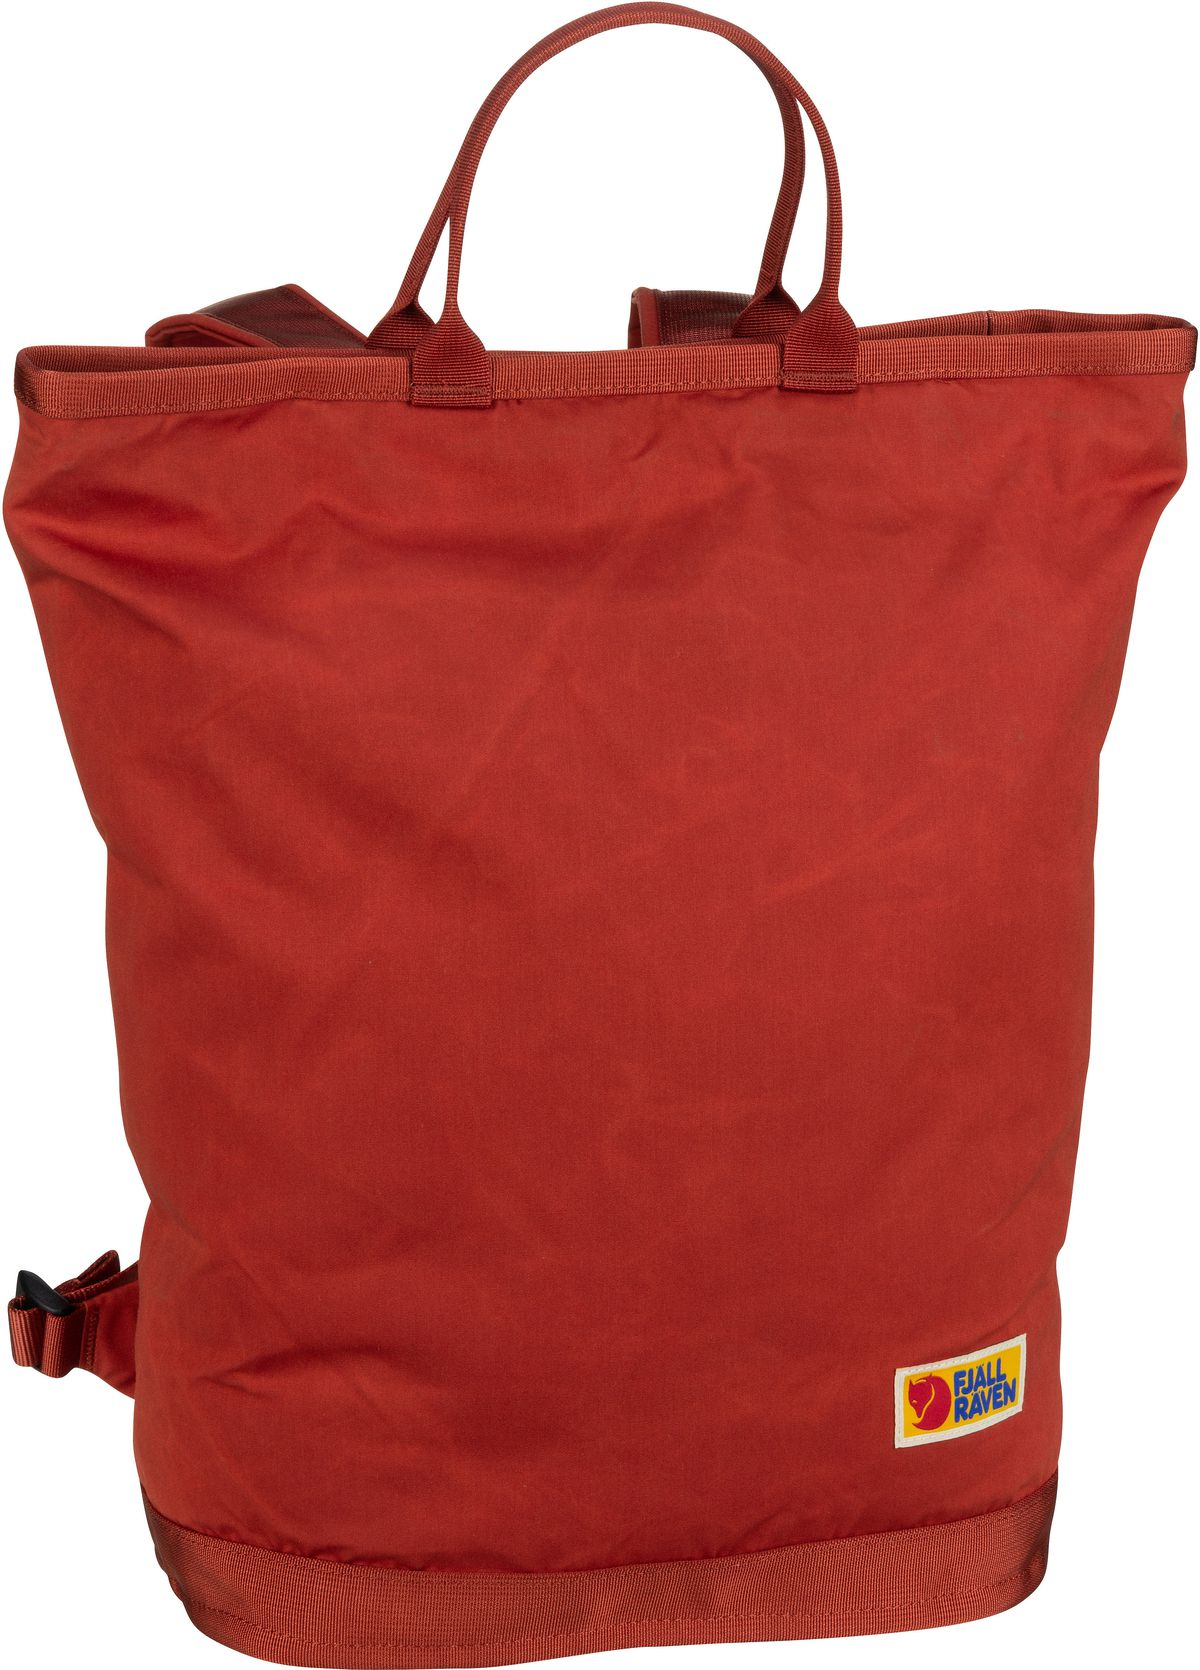 Rucksack / Daypack Vardag Totepack Cabin Red (20 Liter)